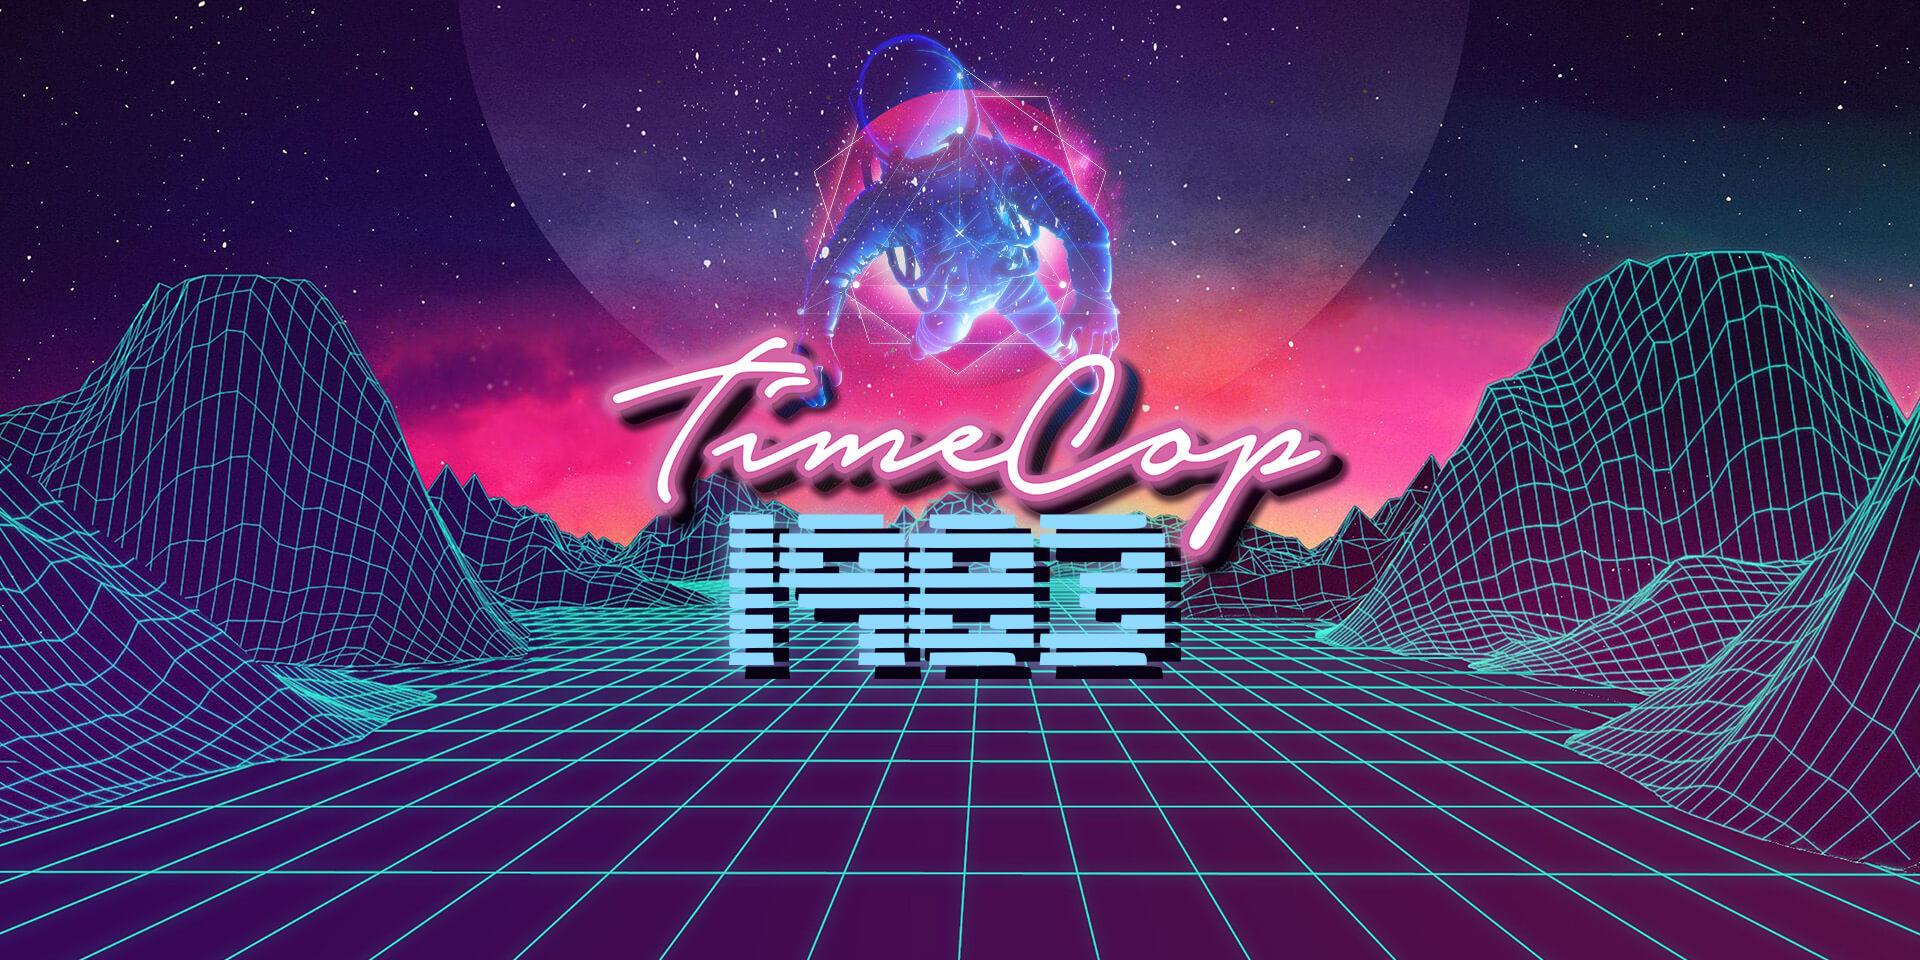 Перший гість музичної сцени — Timecop1983!